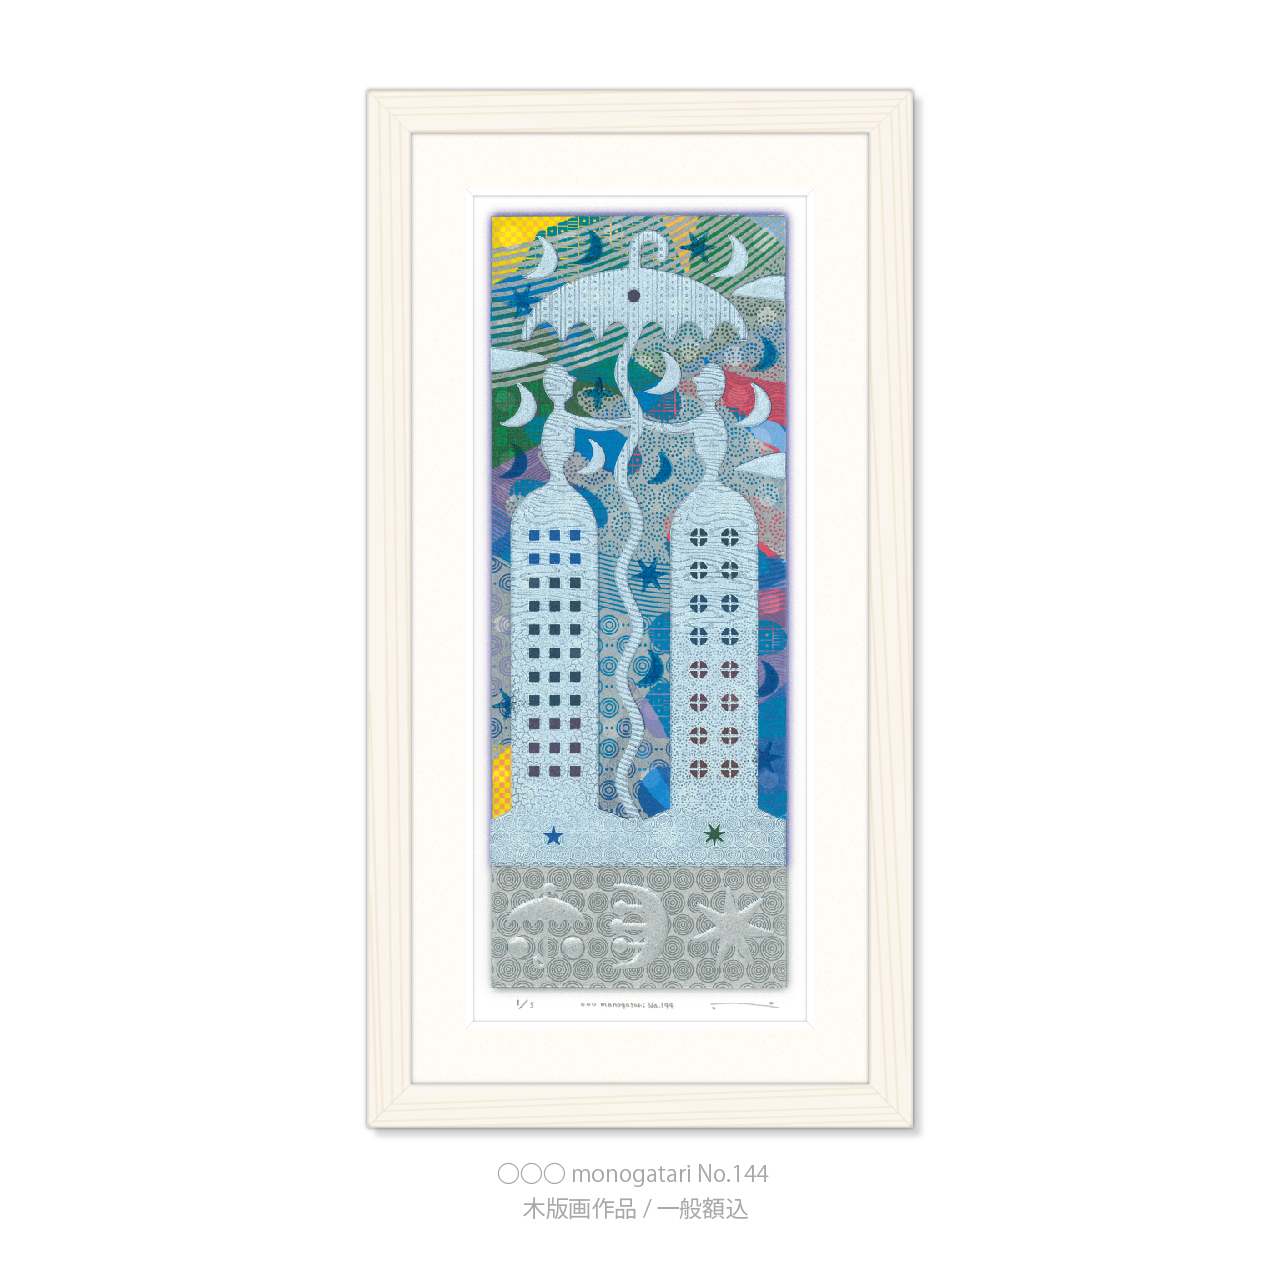 ○○○ monogatari No.144